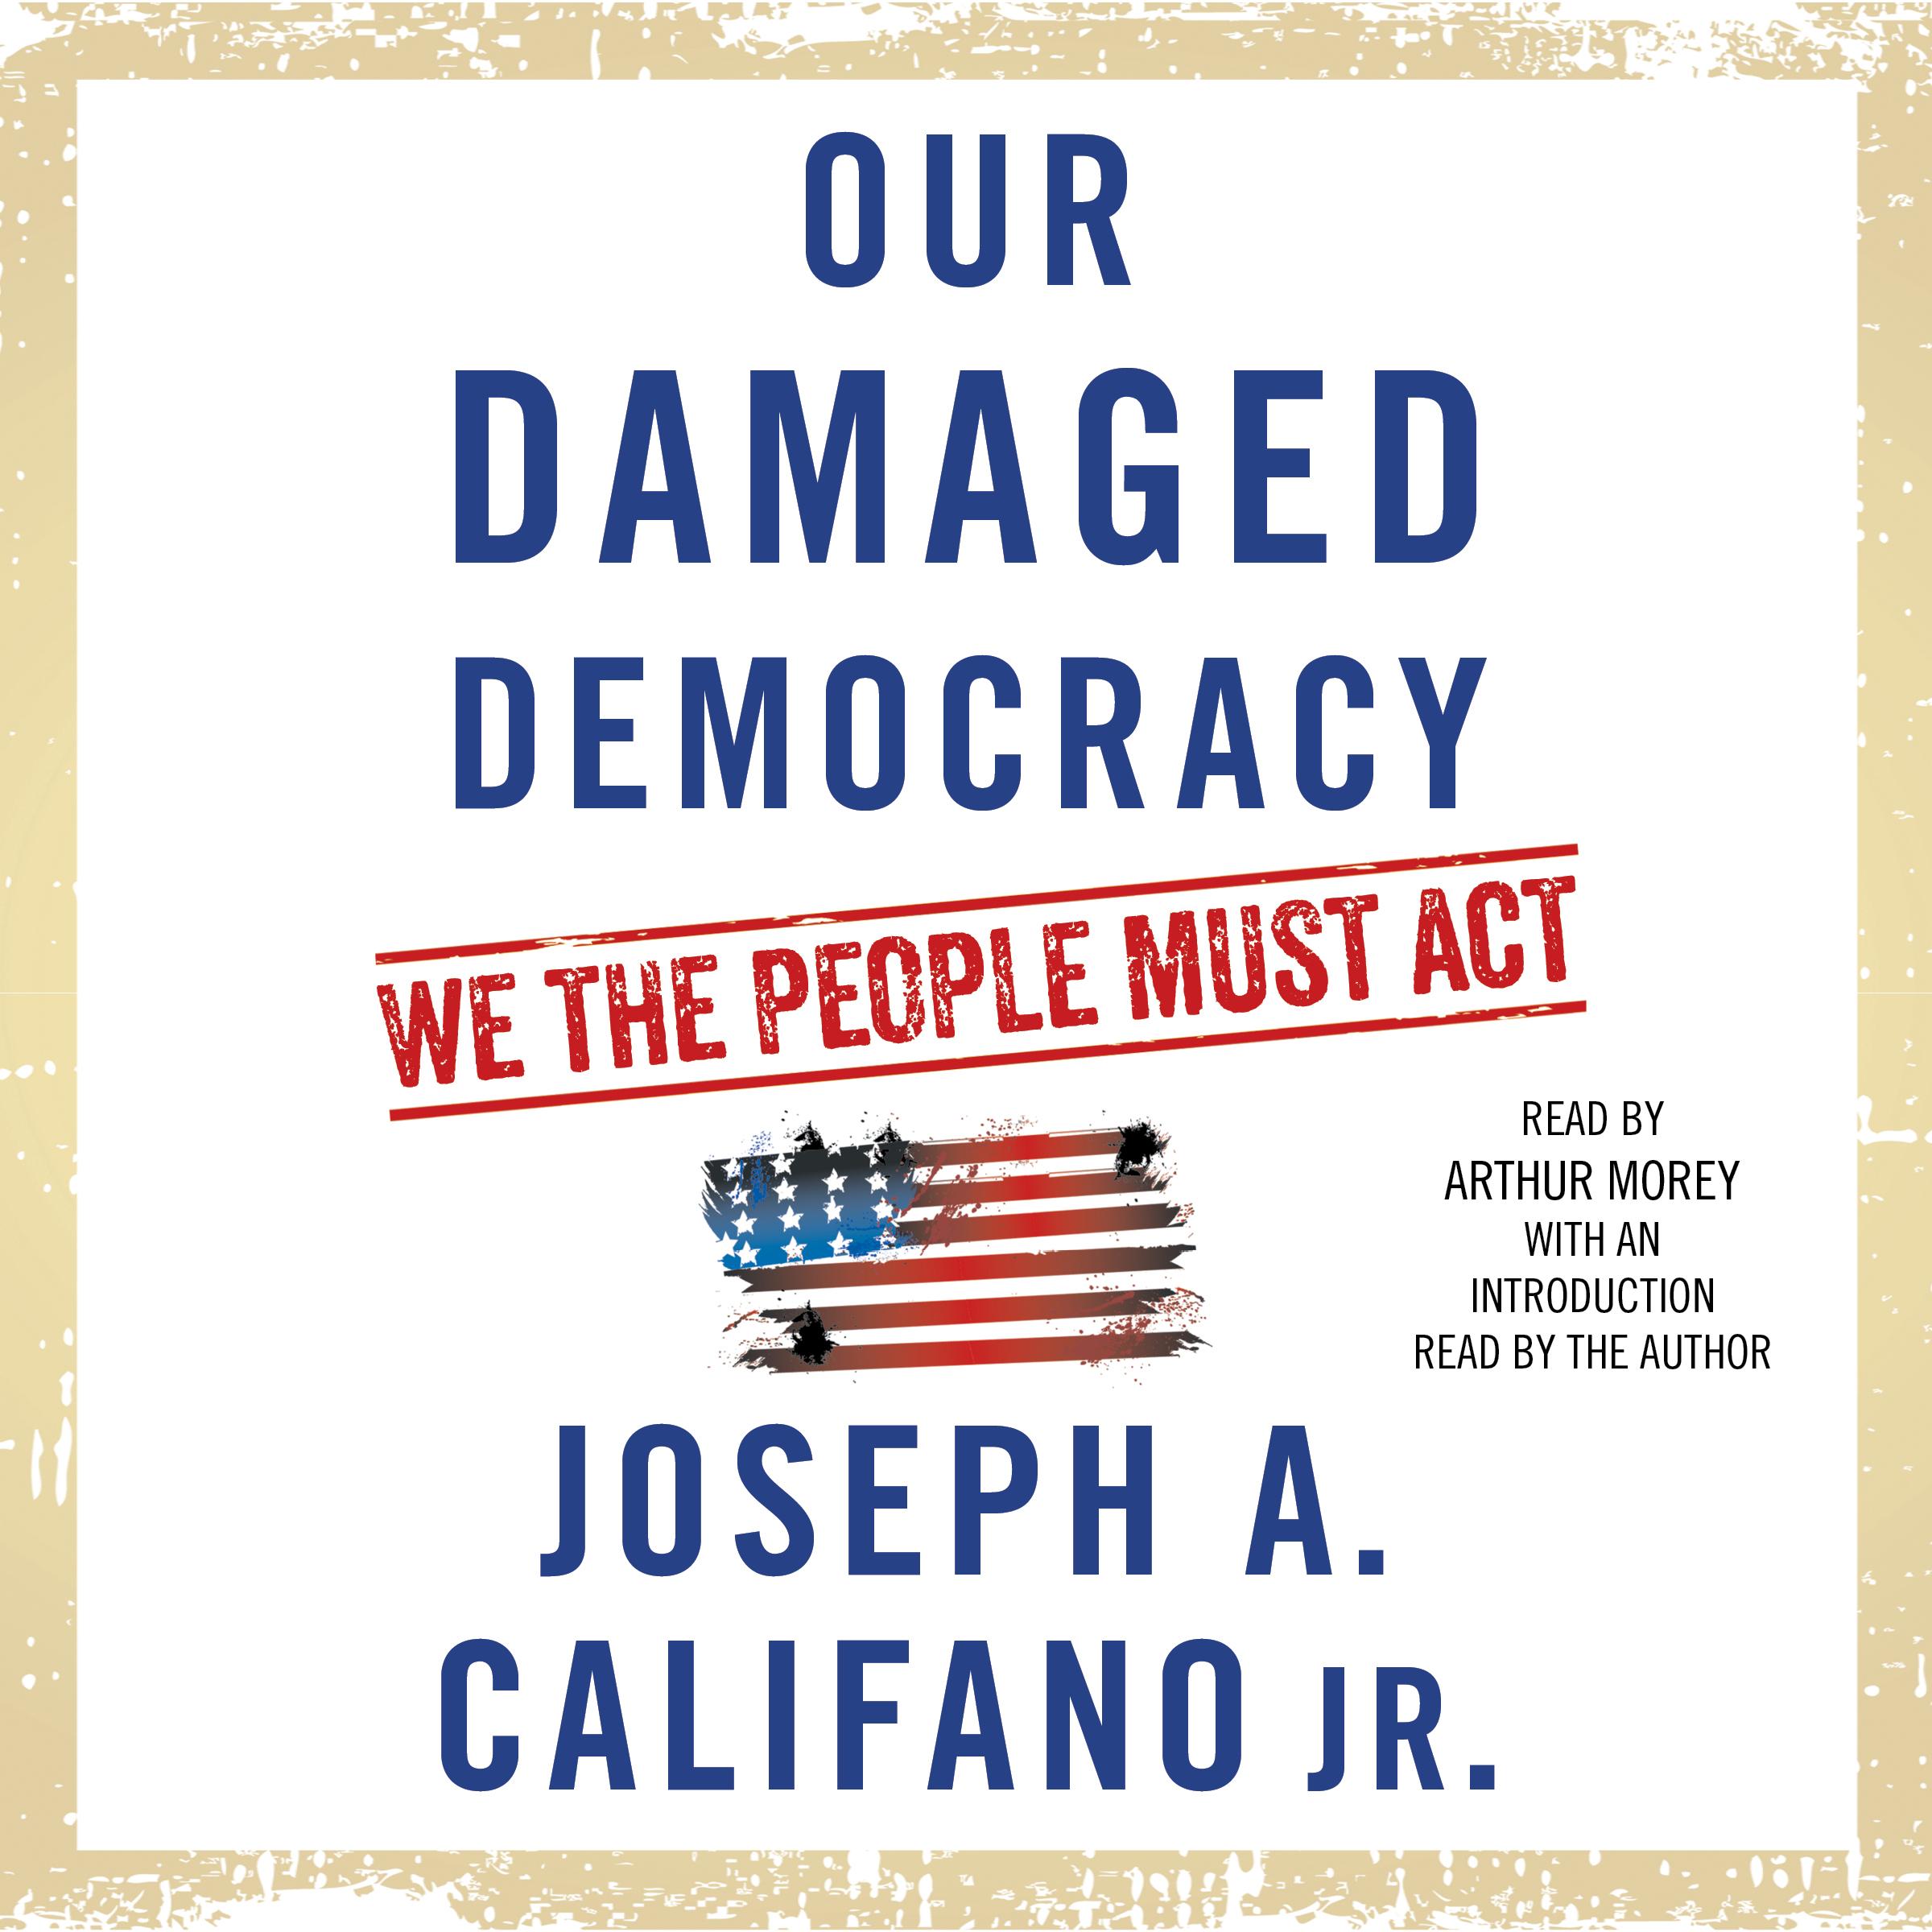 Our damaged democracy 9781508255321 hr